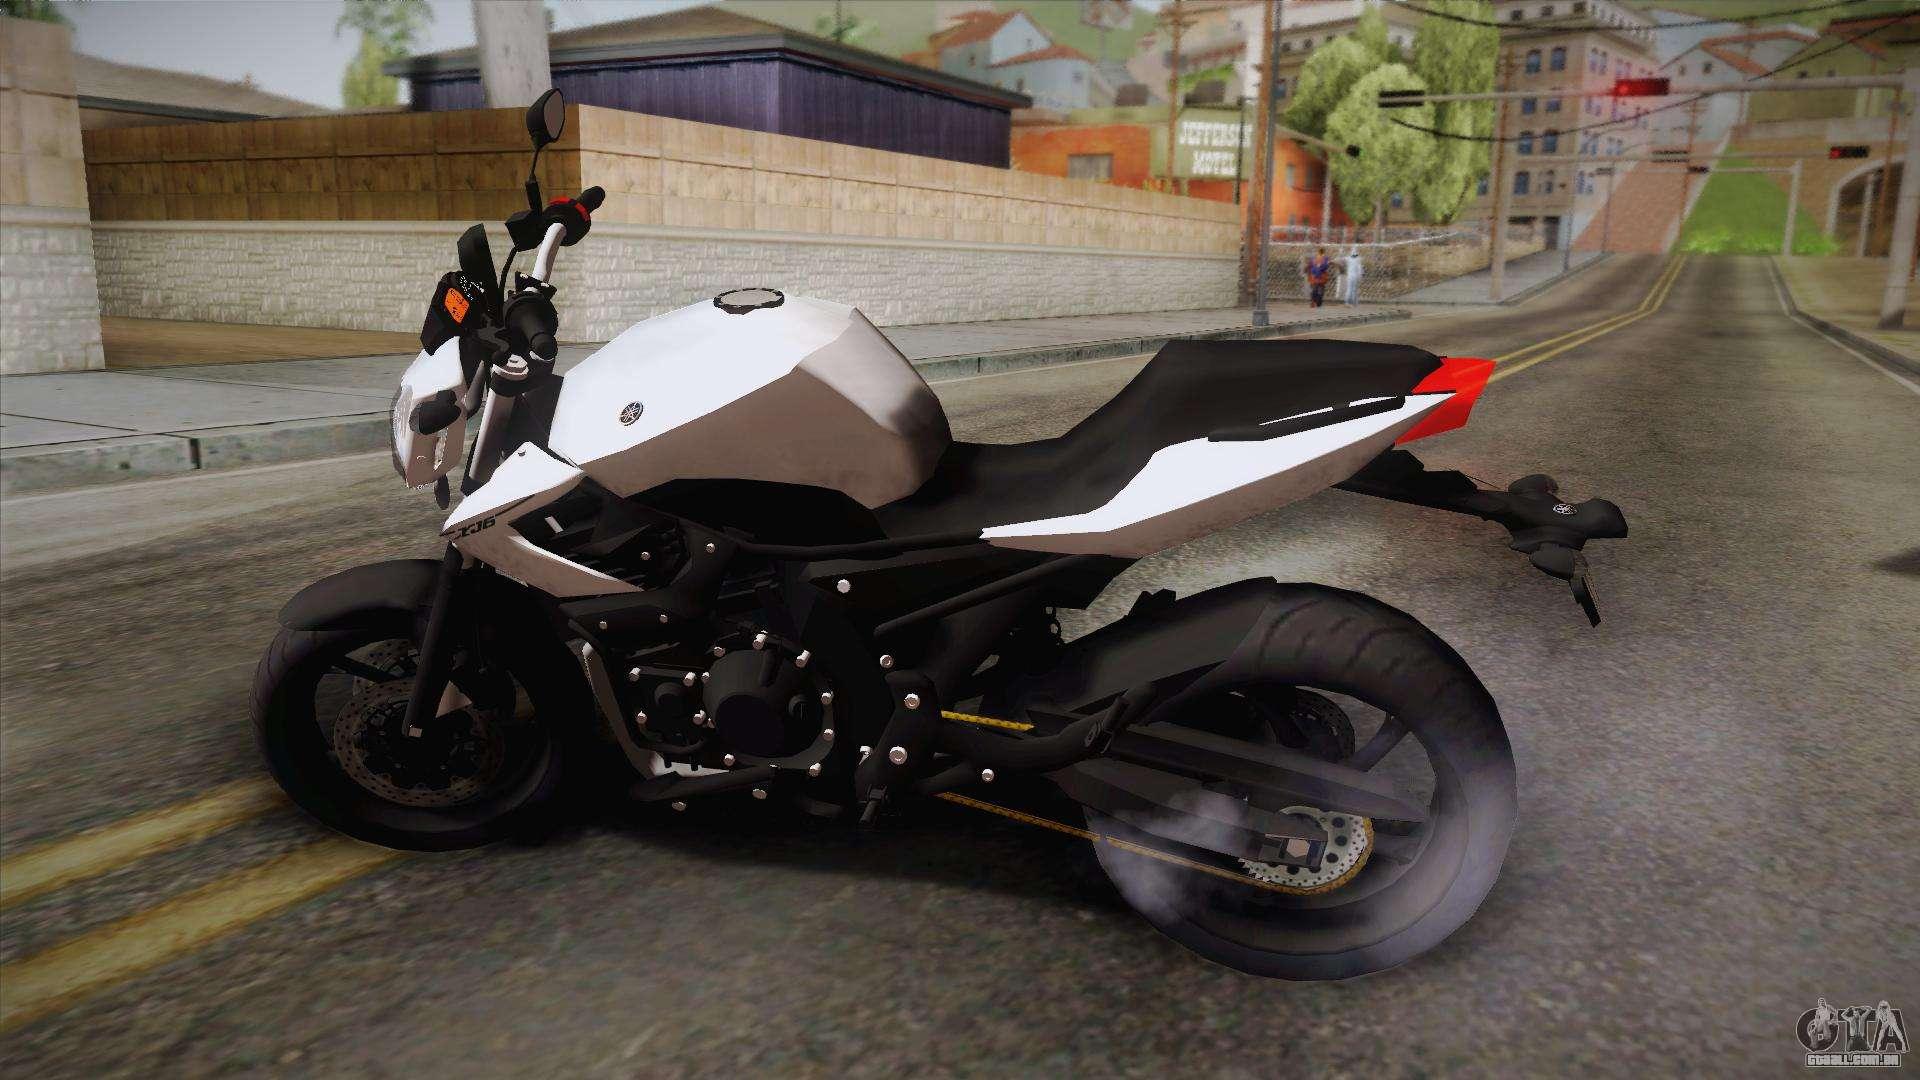 G1 - Yamaha faz recall de XJ6 N, XJ6 F, MT-09 e Super